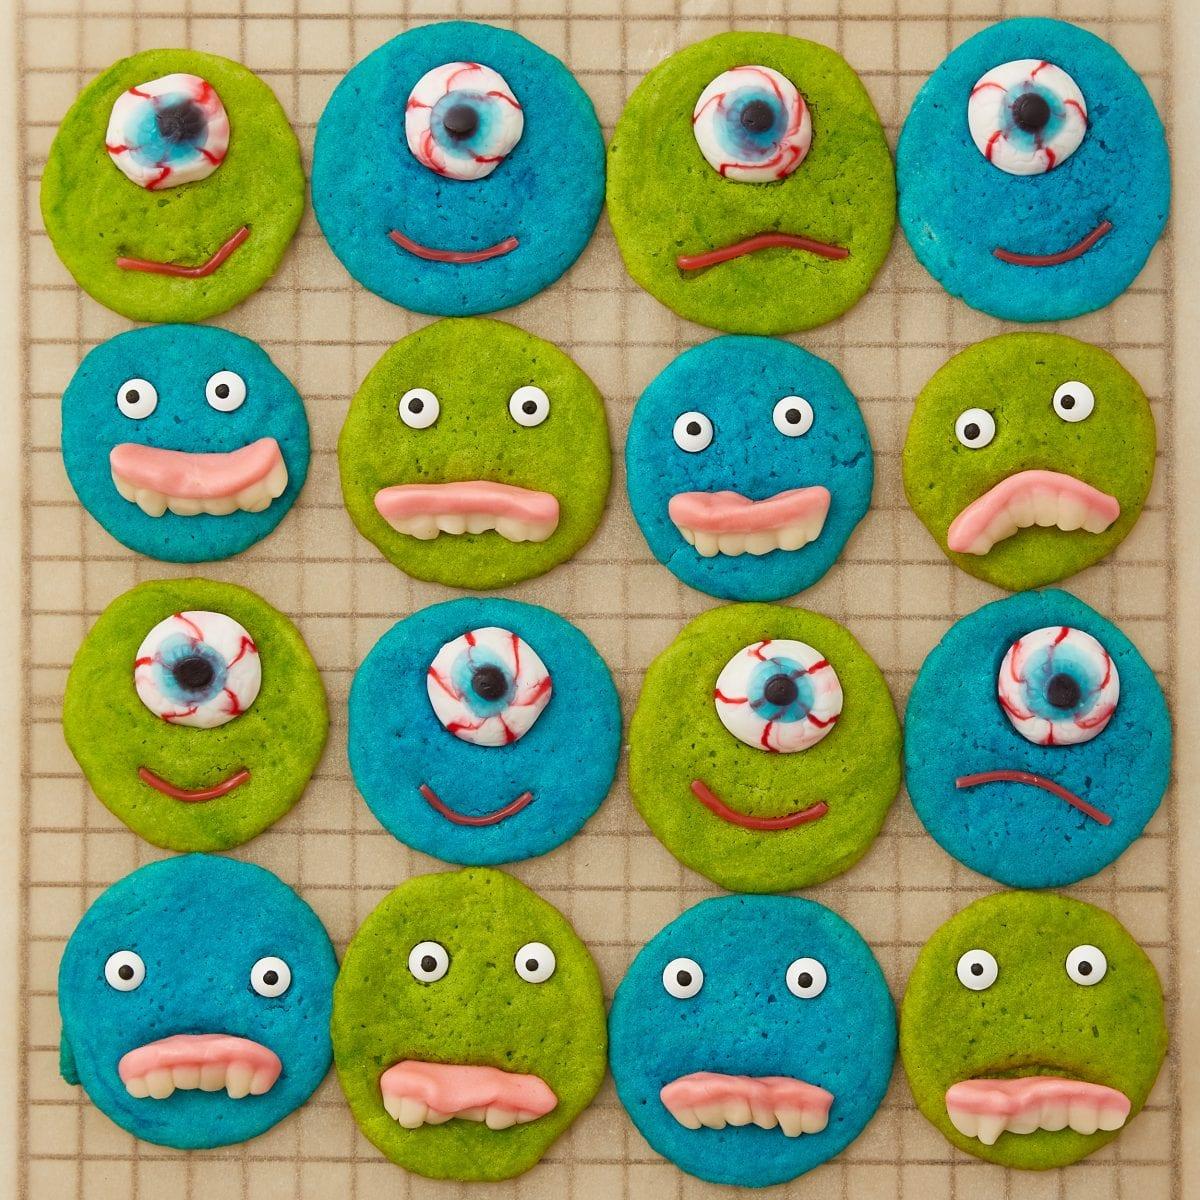 Darcy Miller, Monster, Easy, Kids Activity, Baking, Halloween, Fun, Snack, Food coloring, Cookie